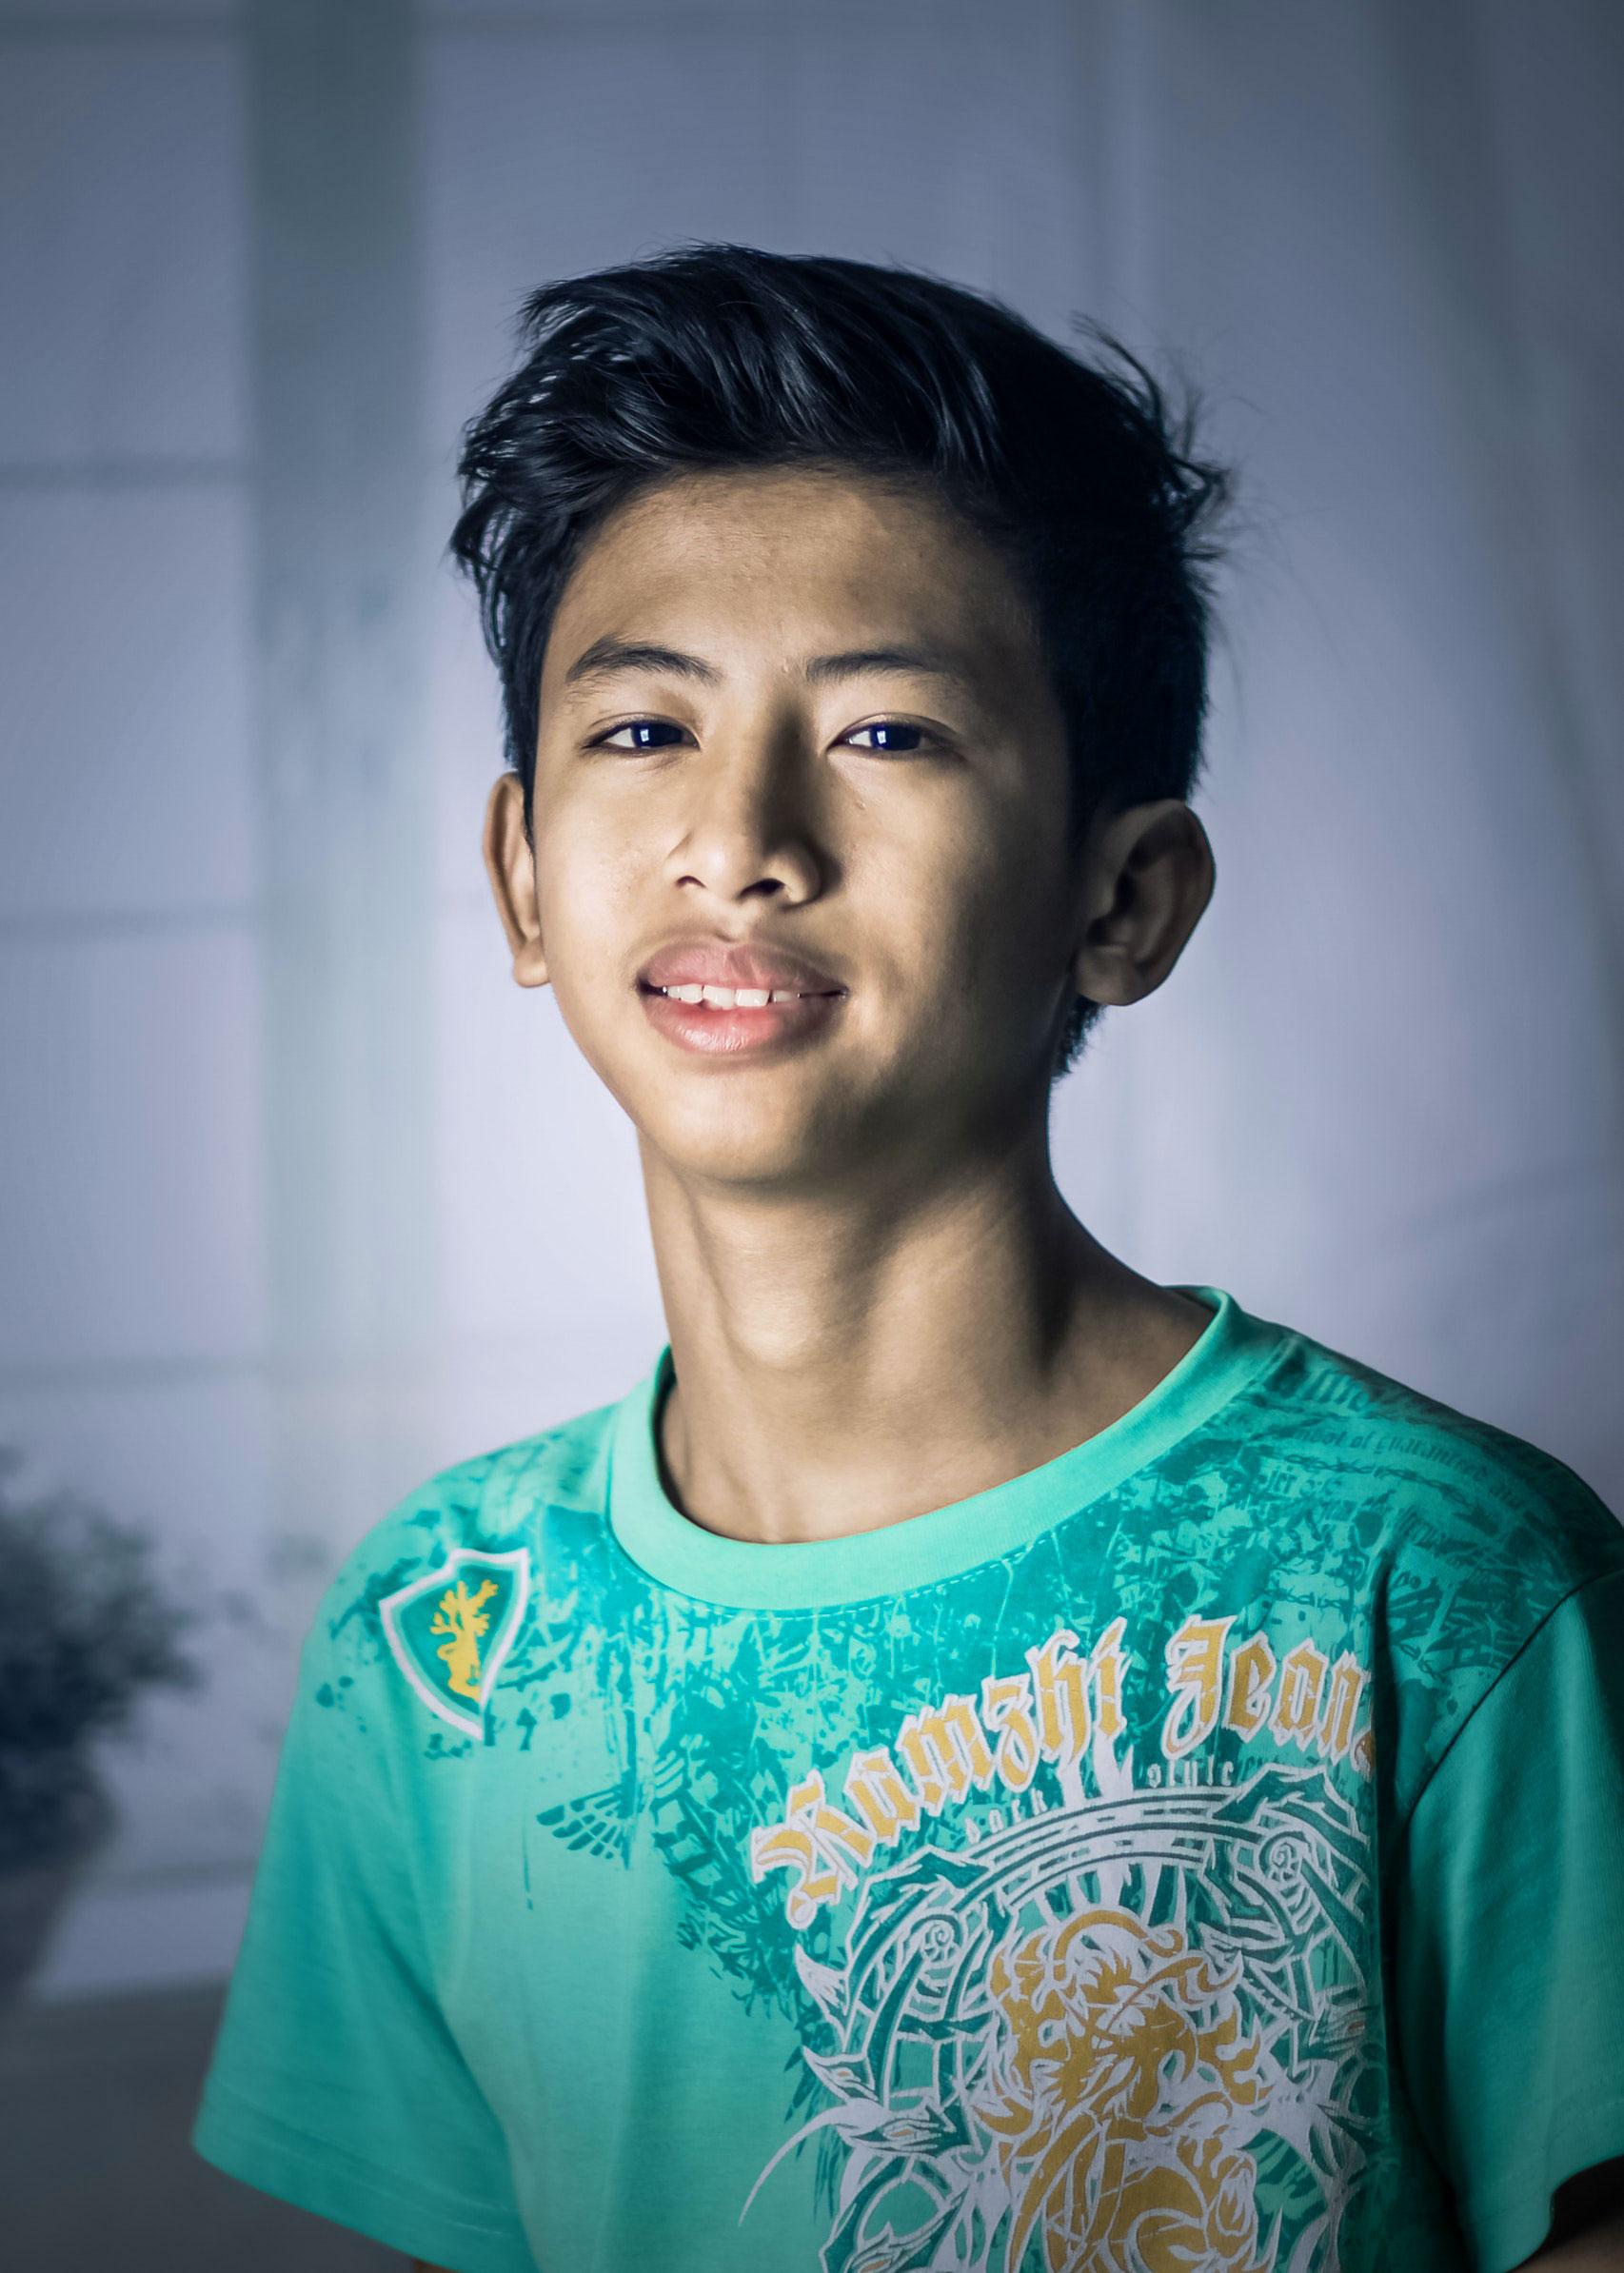 Latest Sad Boy Dp Images wallpaper photo hd